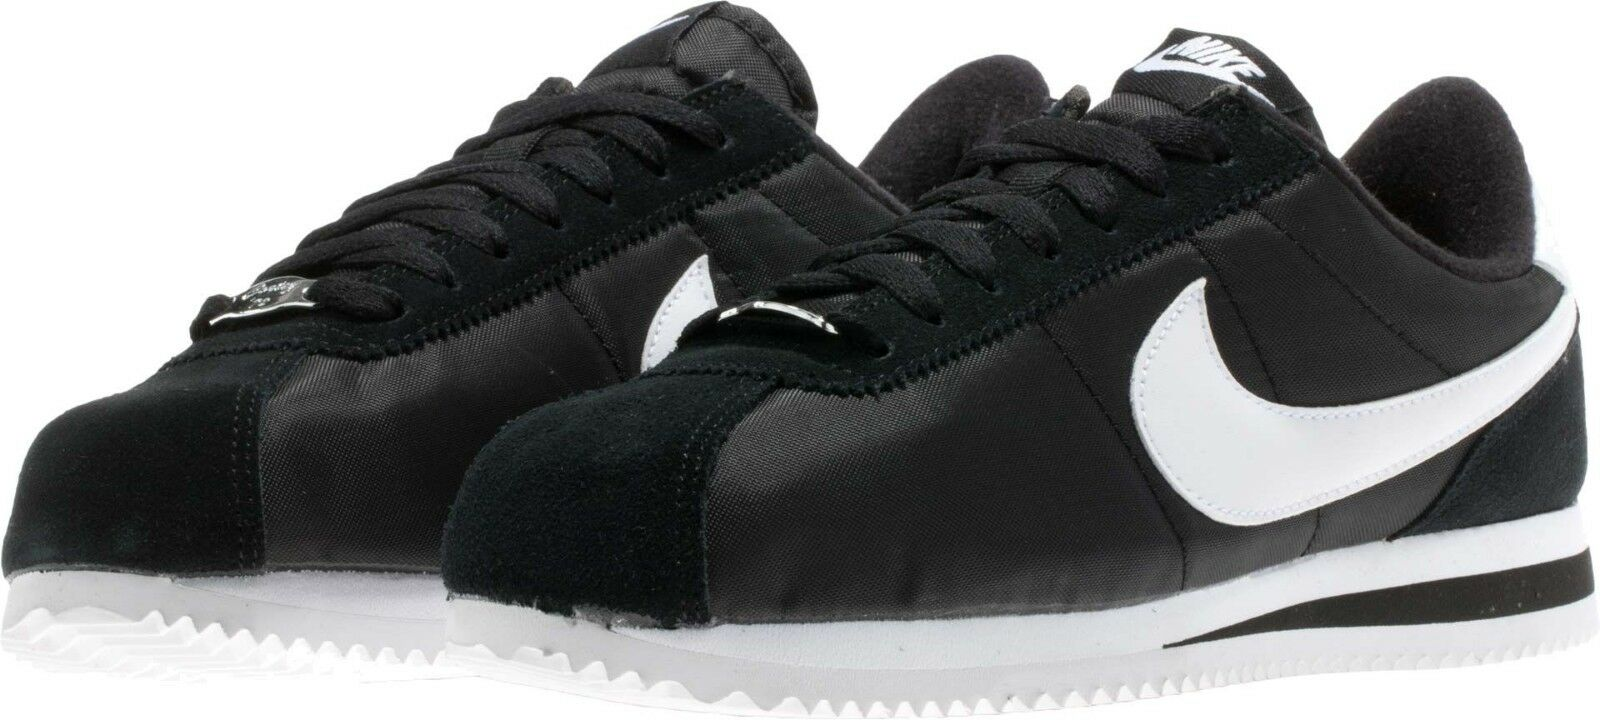 Men's Nike Cortez Basic Nylon Casual shoes Black White Sizes 8-12 NIB 807472-011